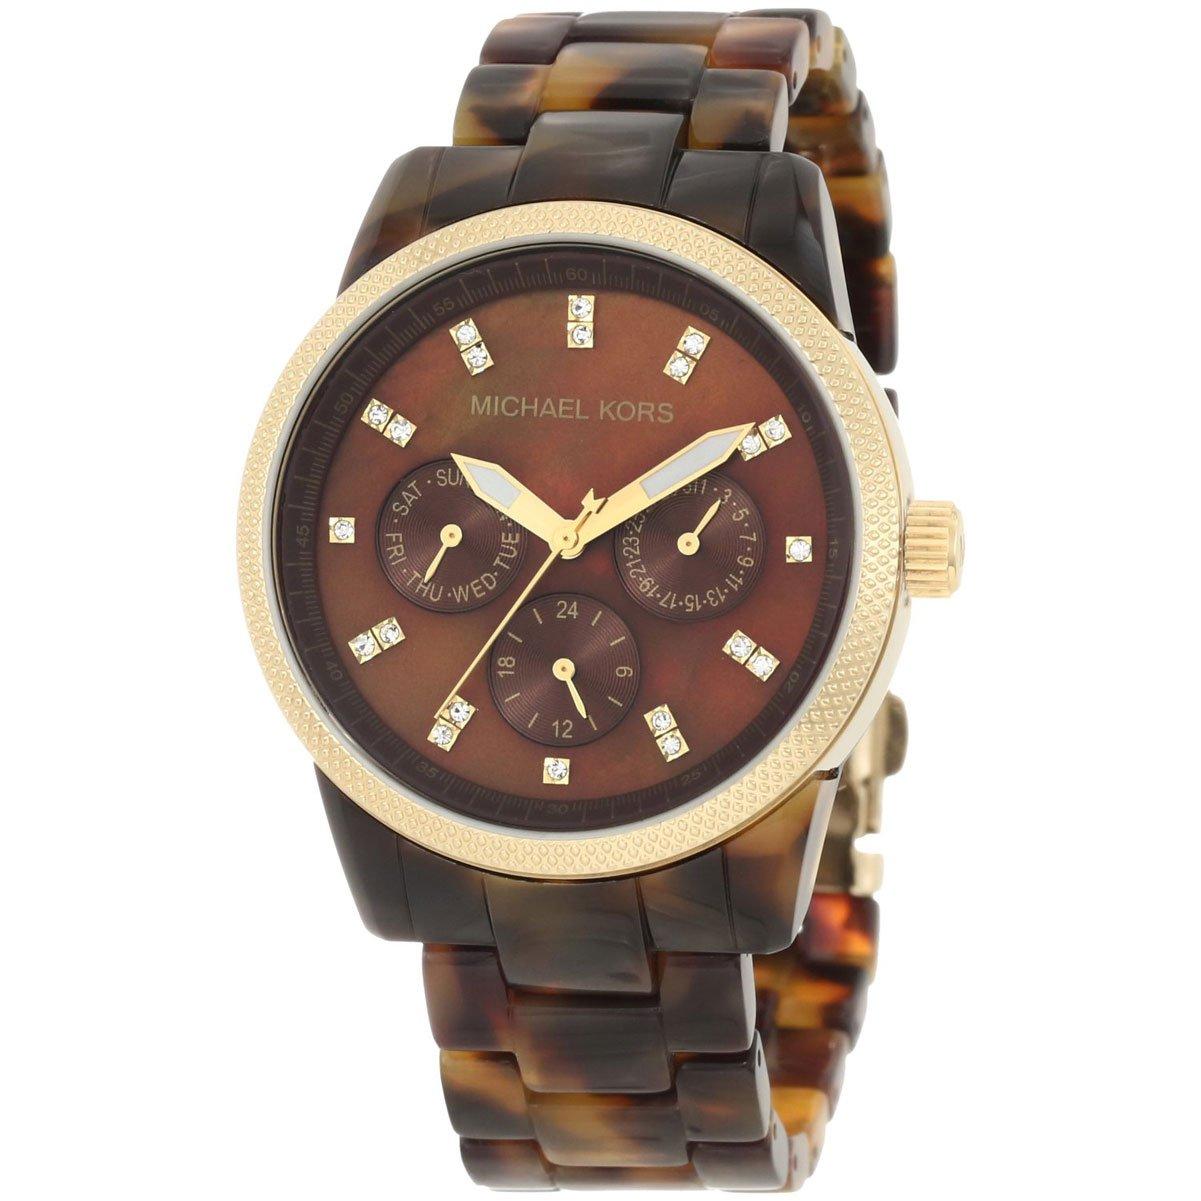 Michael Kors MK5038 Women's Chronograph Ritz Acrylic Tortoiseshell Bracelet Watch by Michael Kors